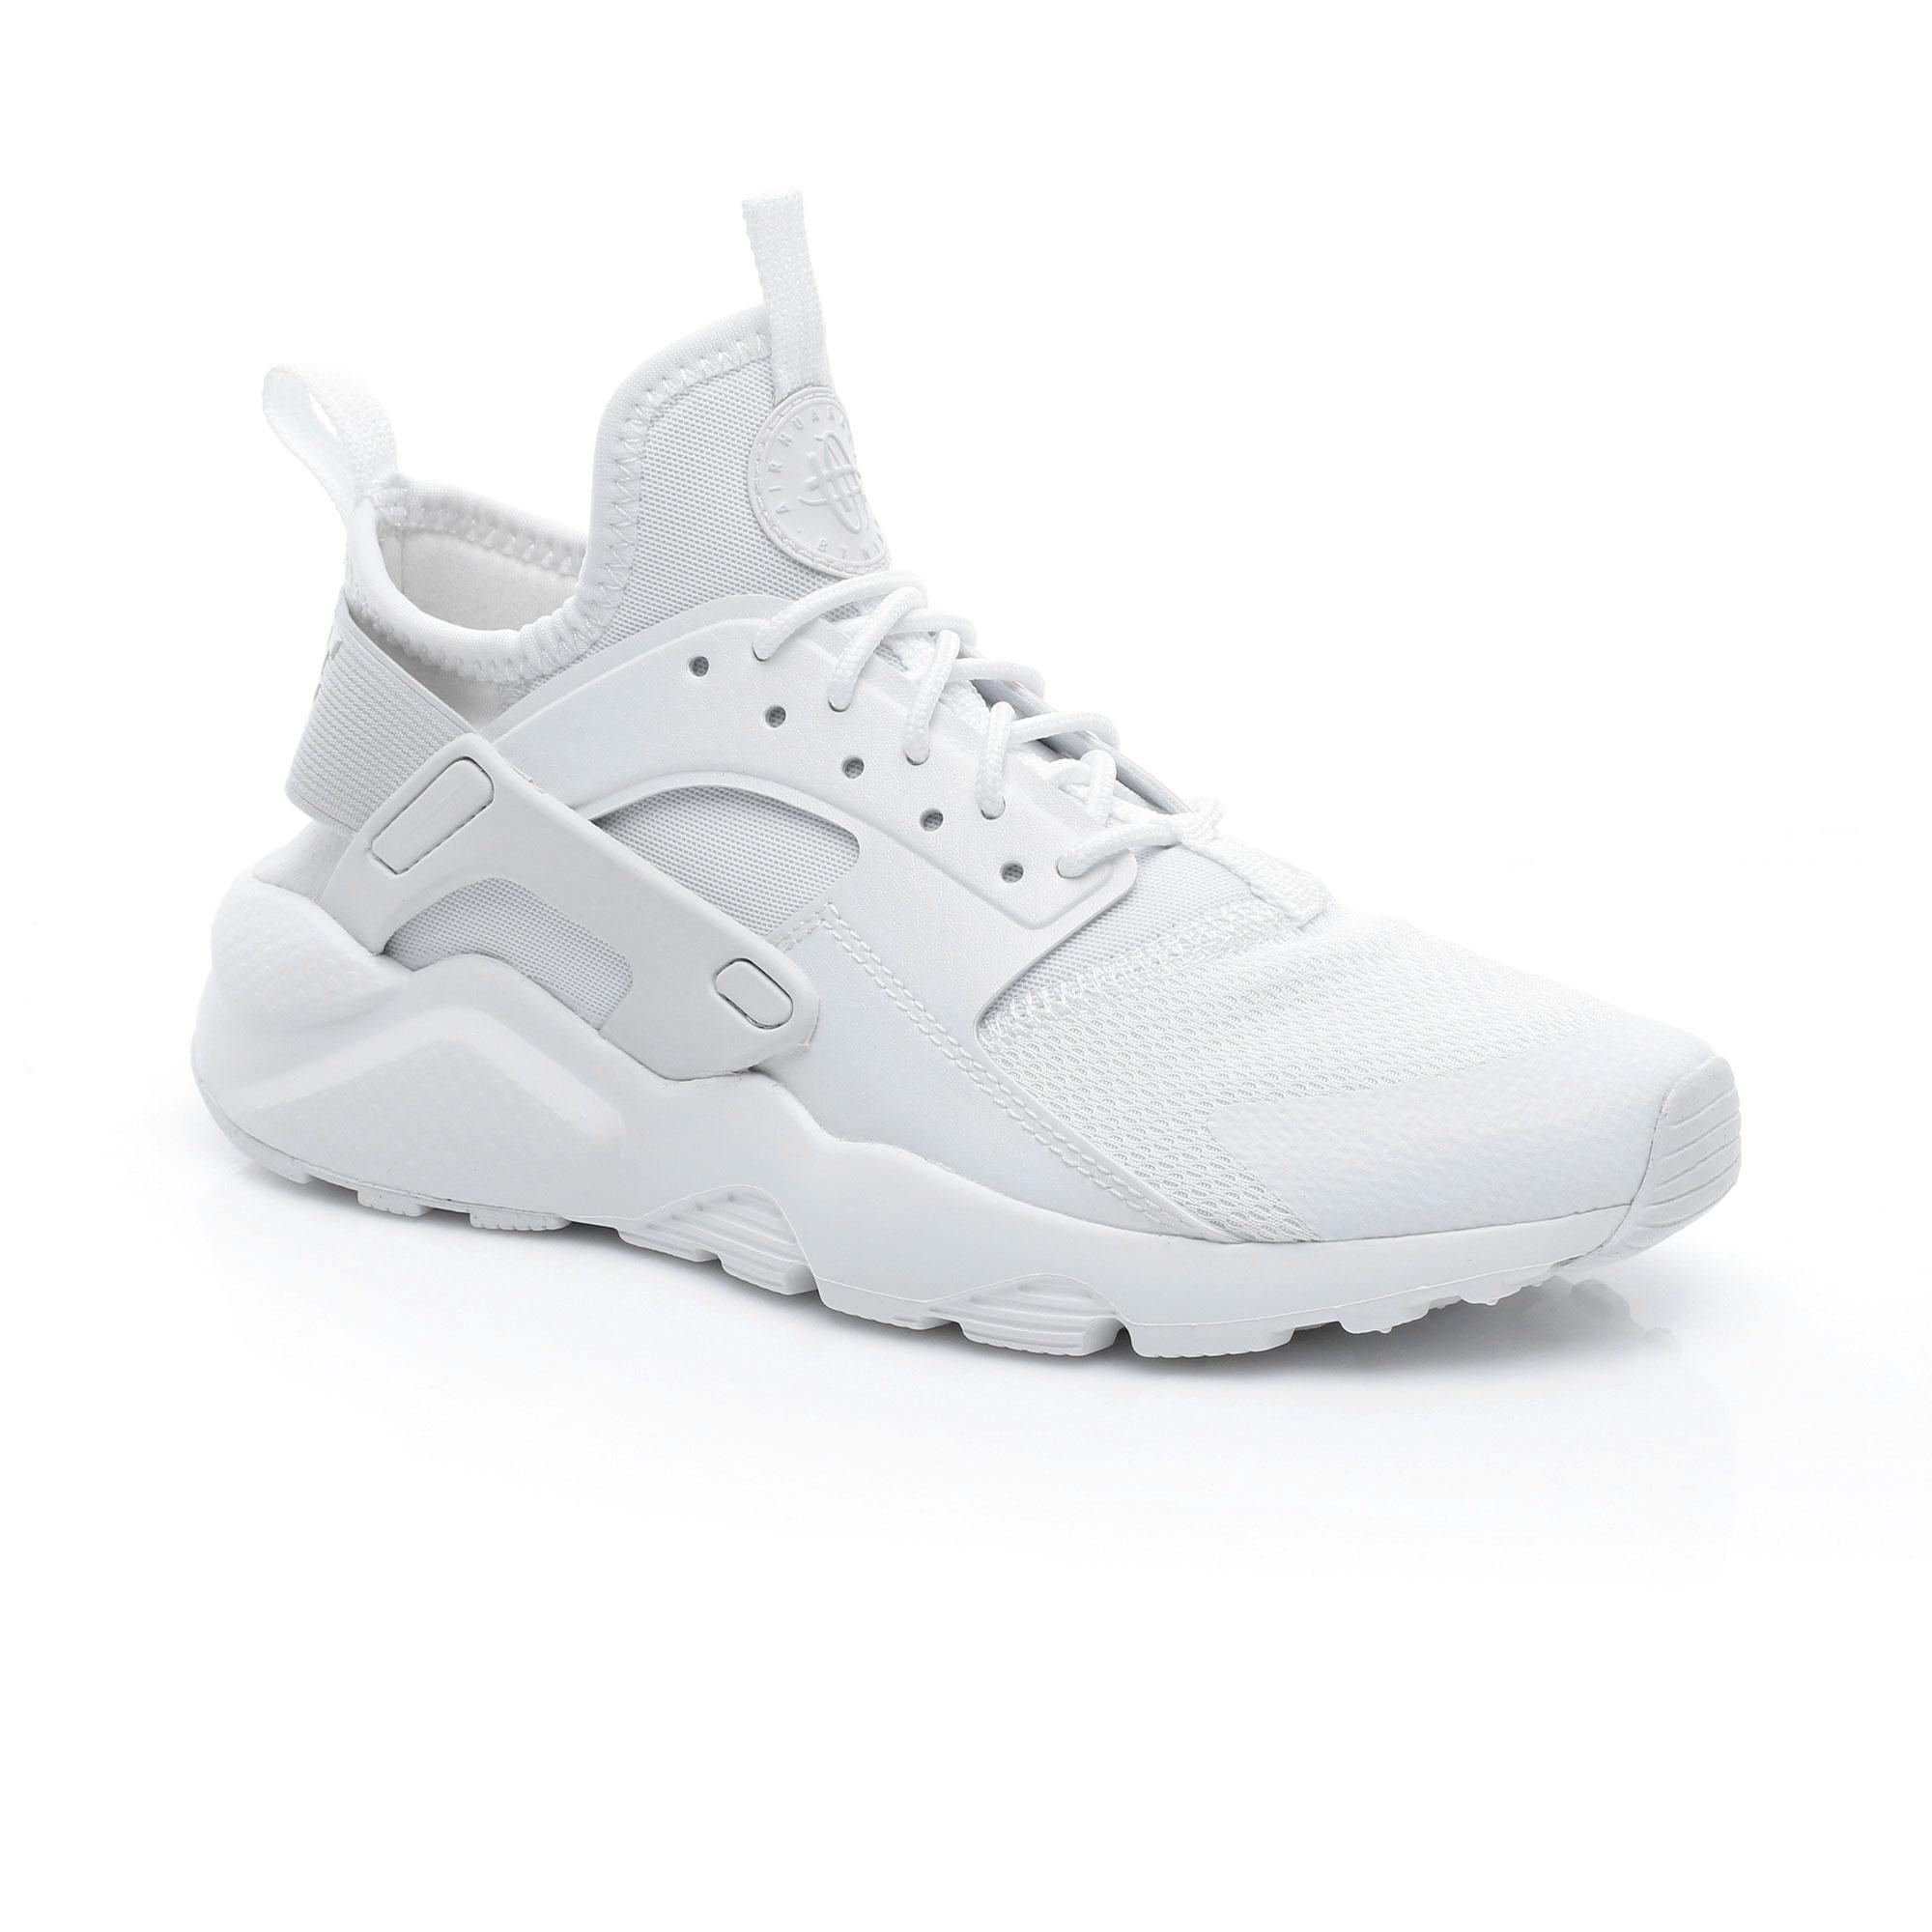 Nike Air Huarache Run Ultra Gs Beyaz Spor Ayakkabı